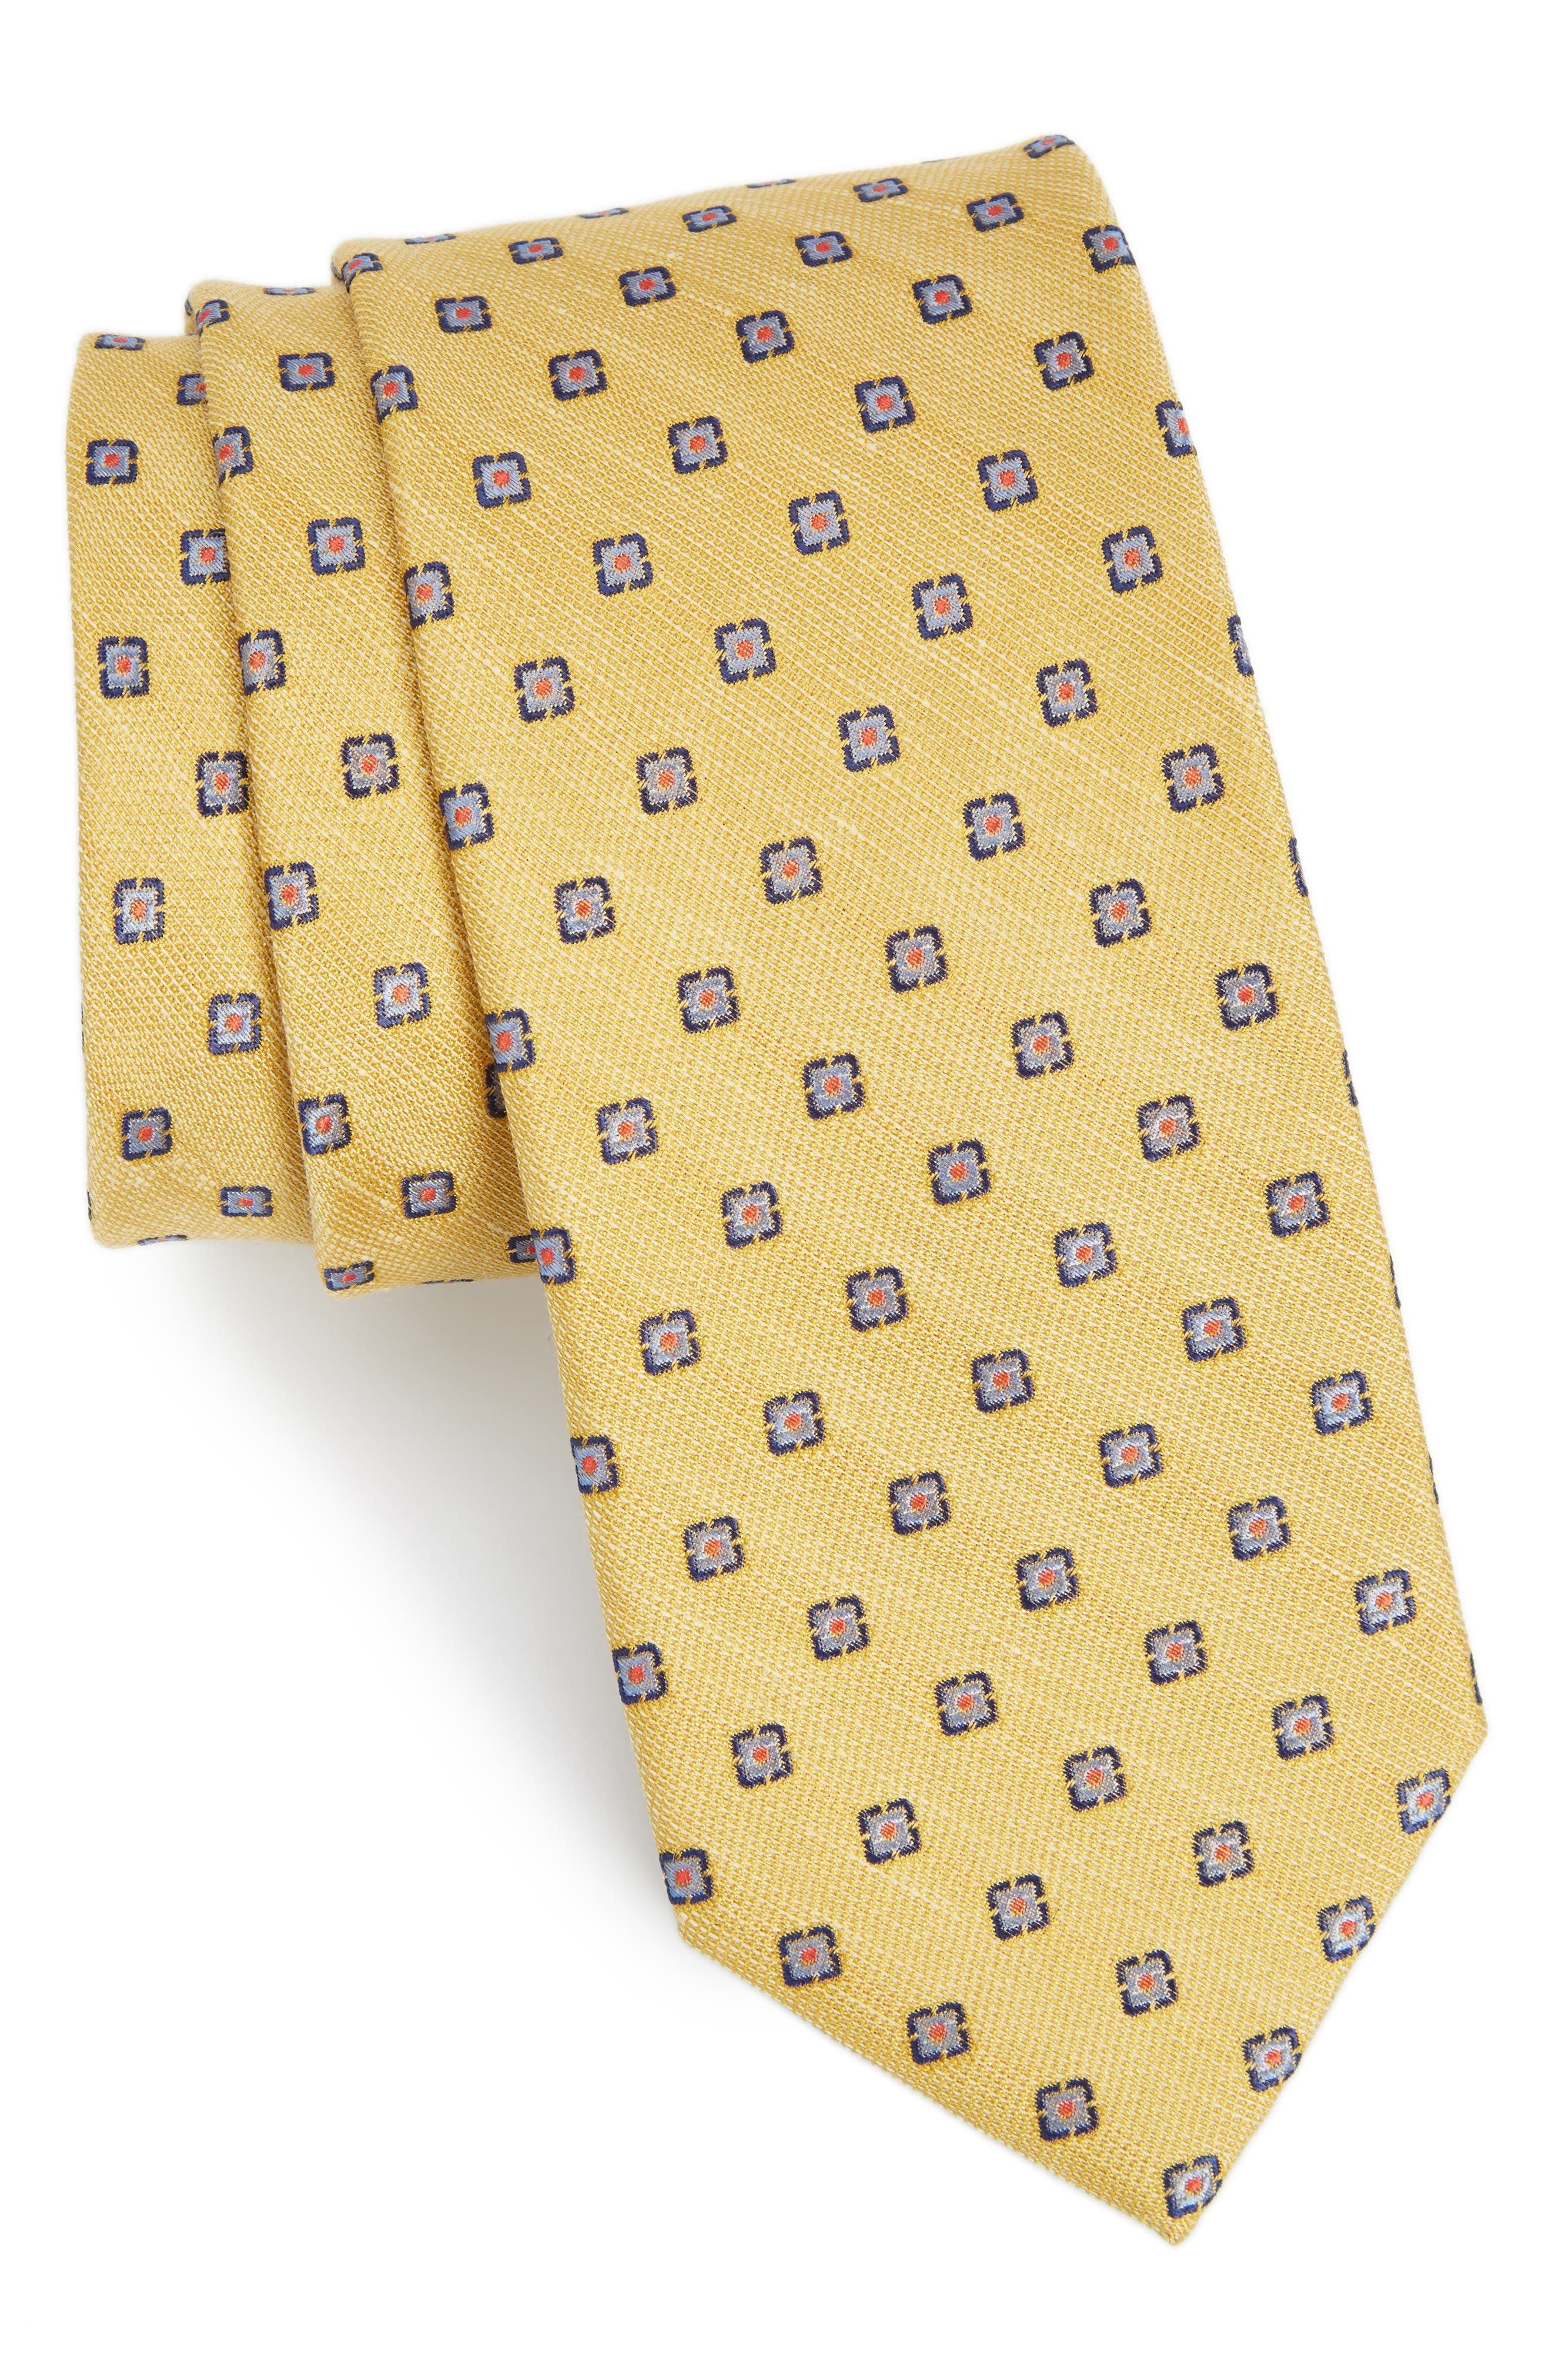 The Tie Bar Medallion Scene Silk & Linen Tie